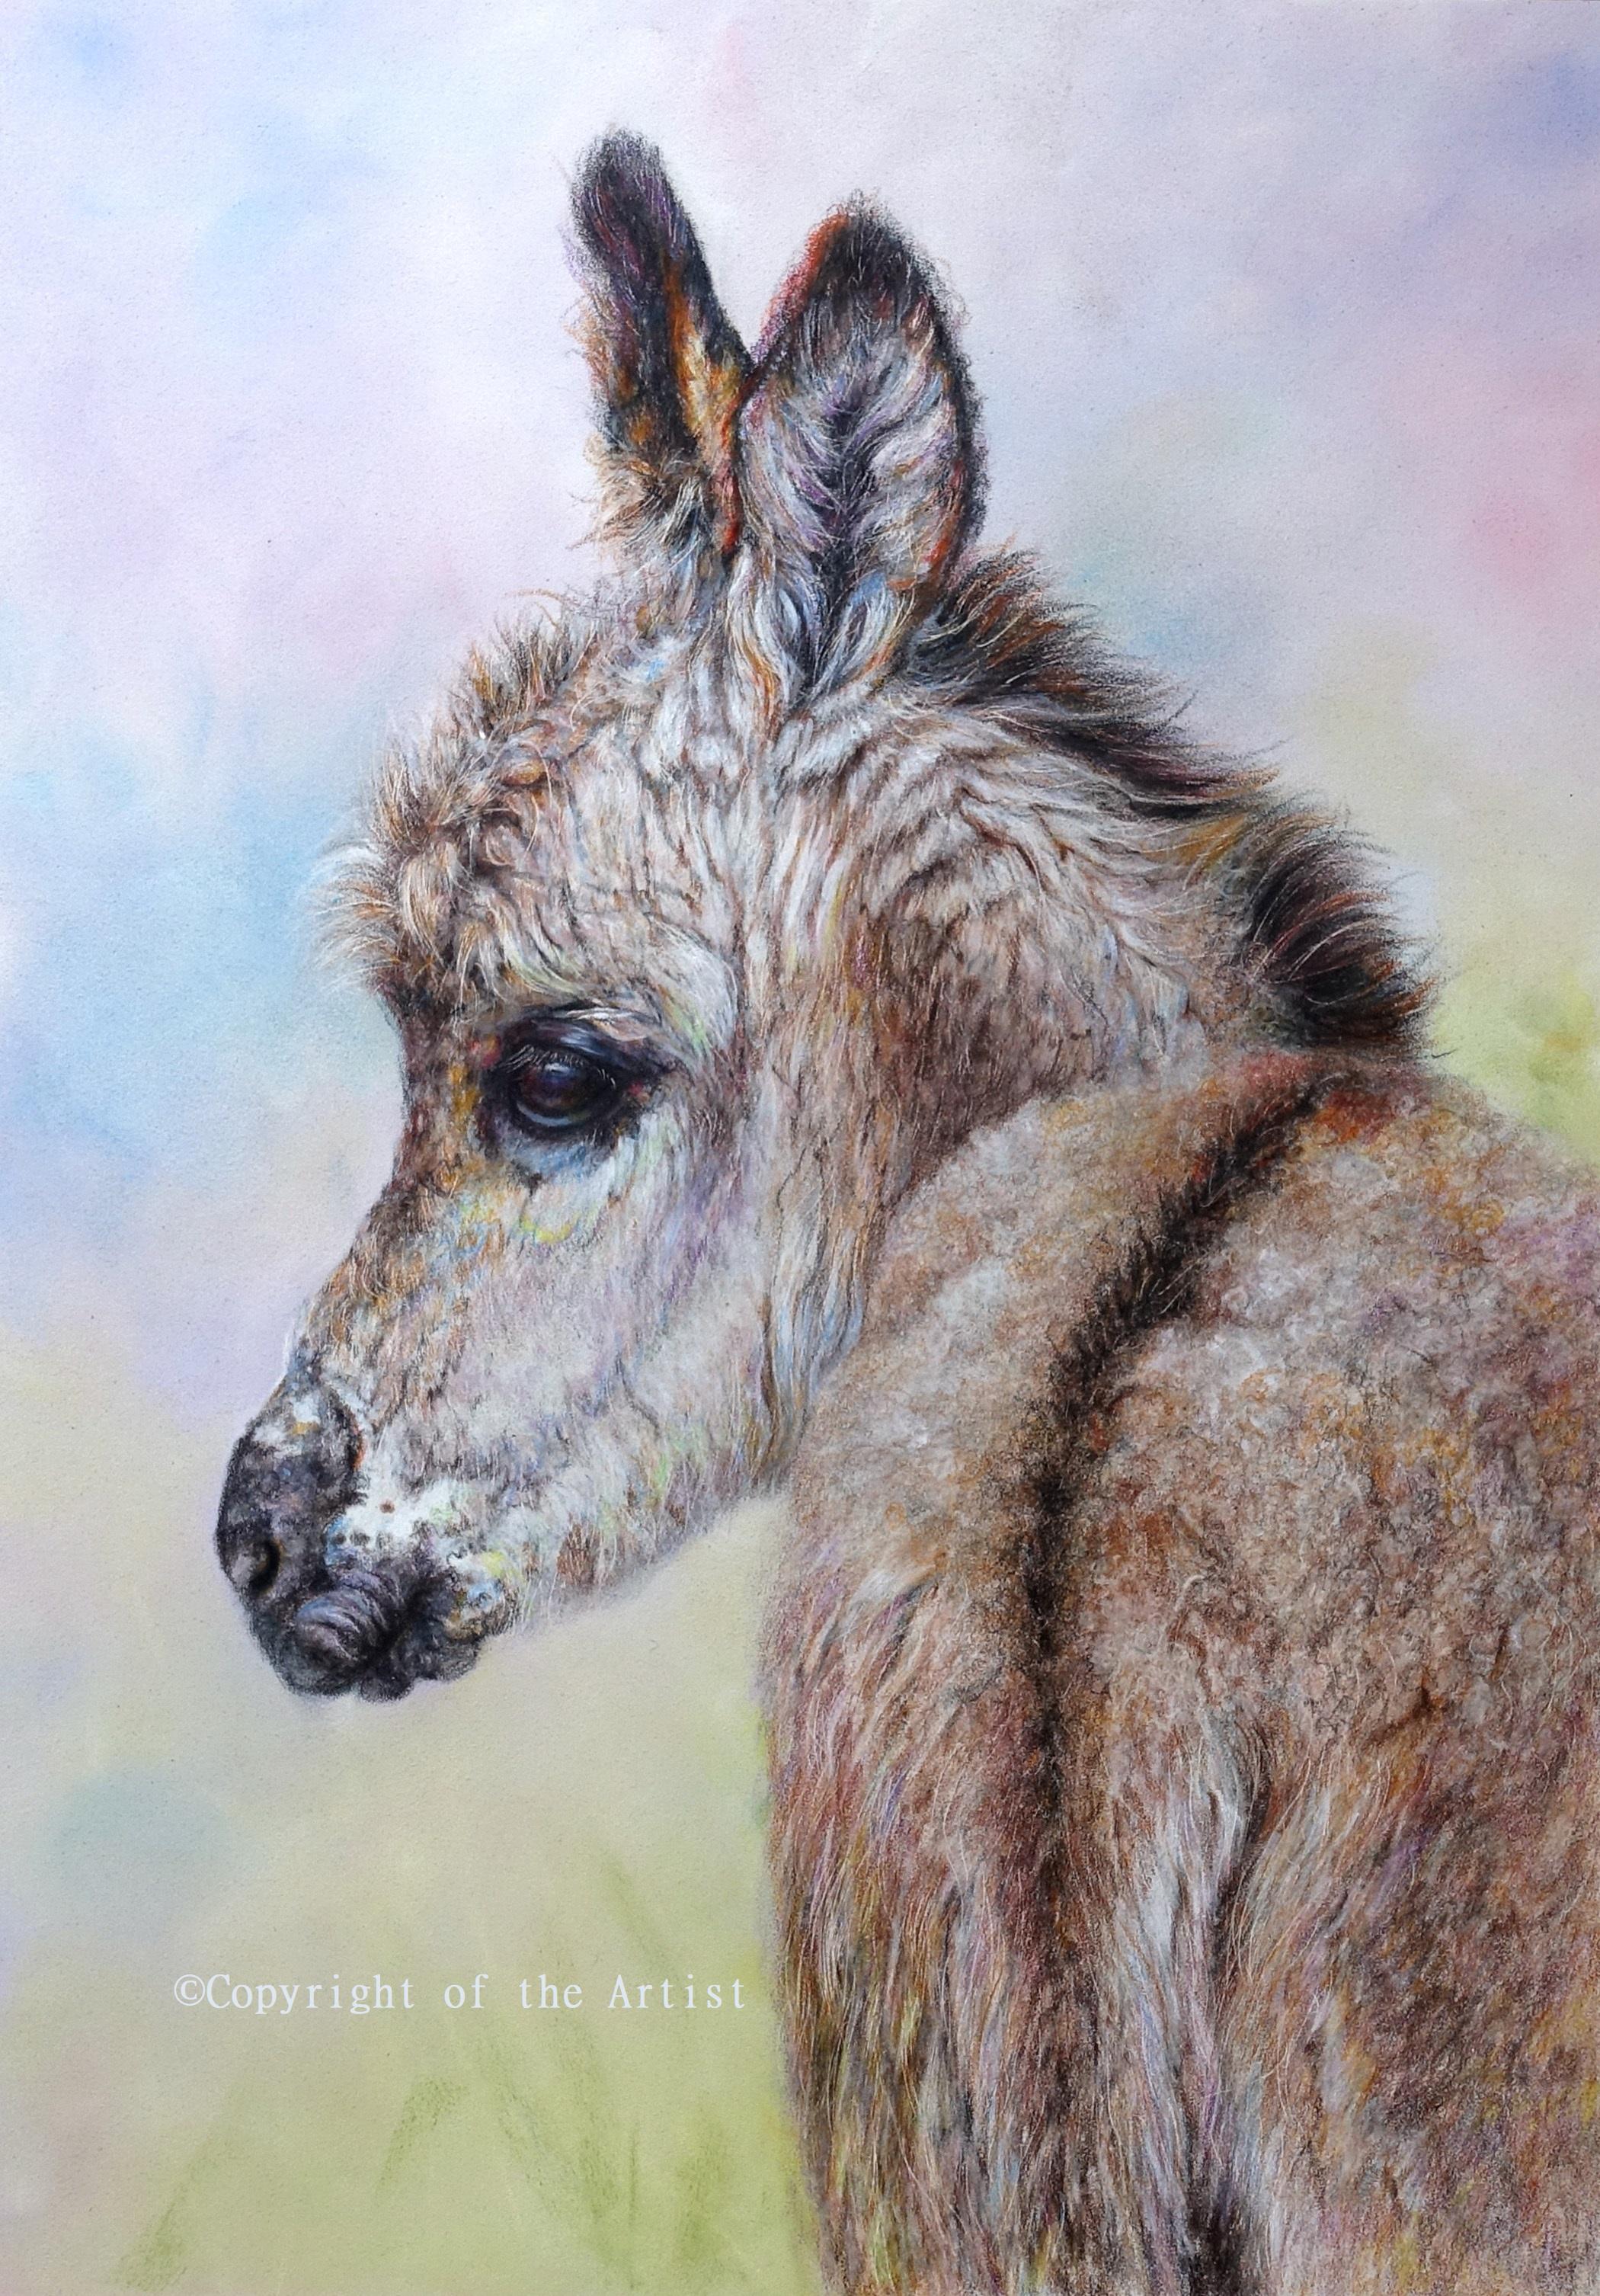 pastel of a donkey foal